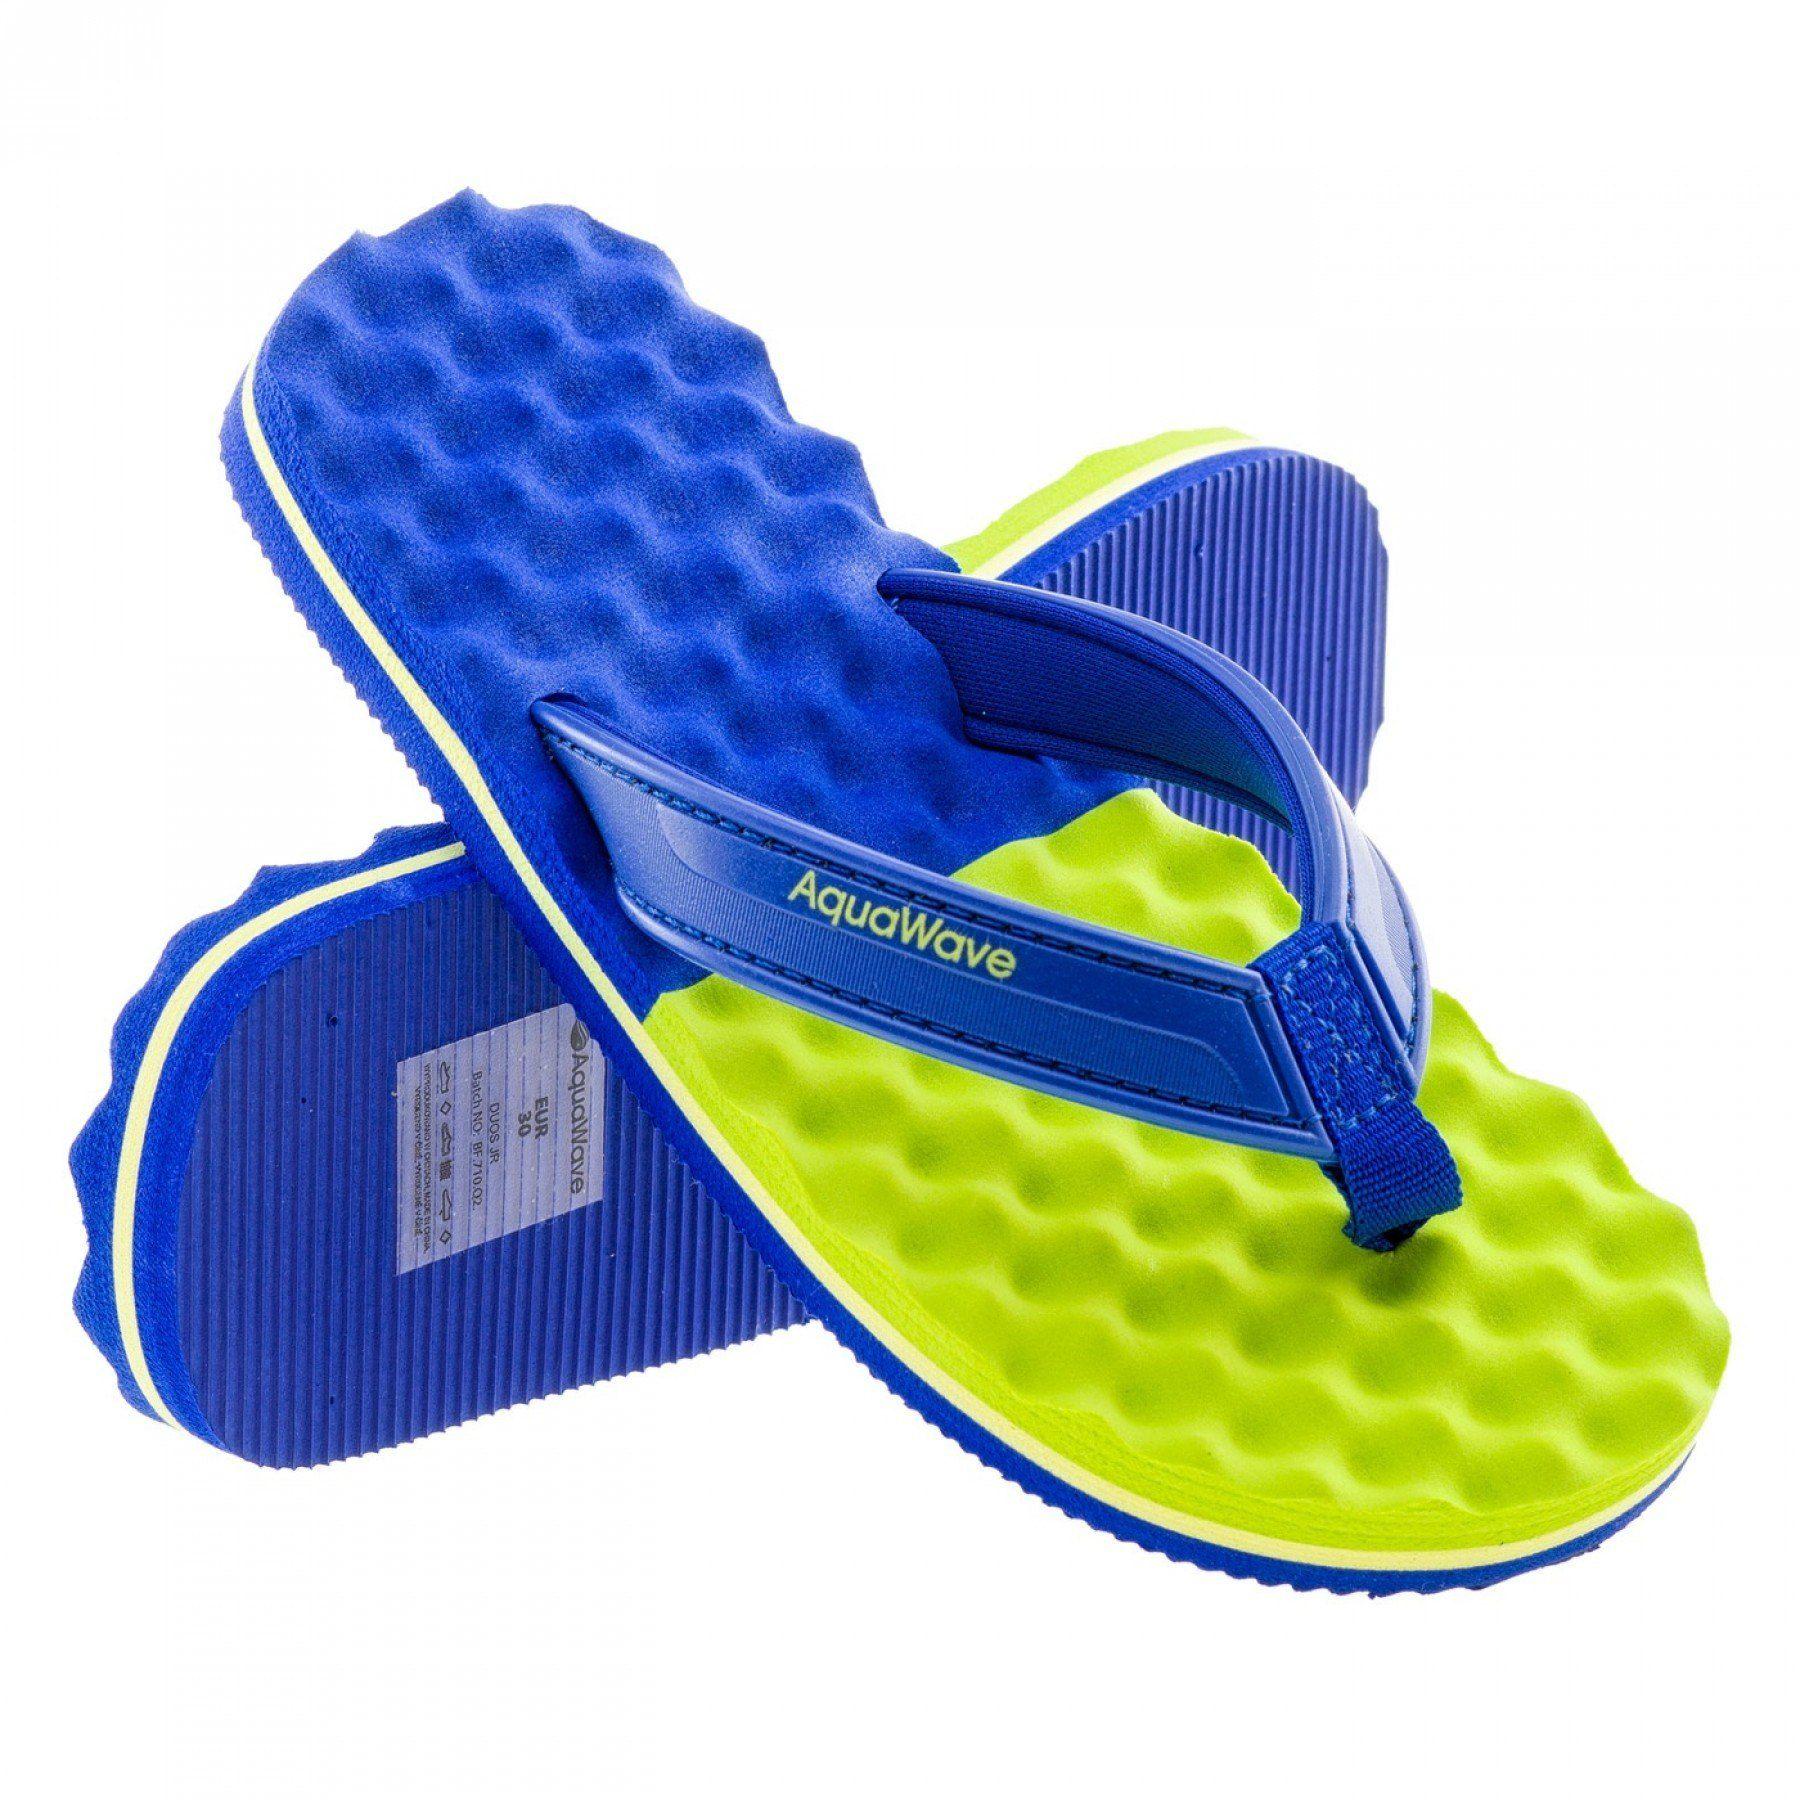 buty na lato dla dziecka